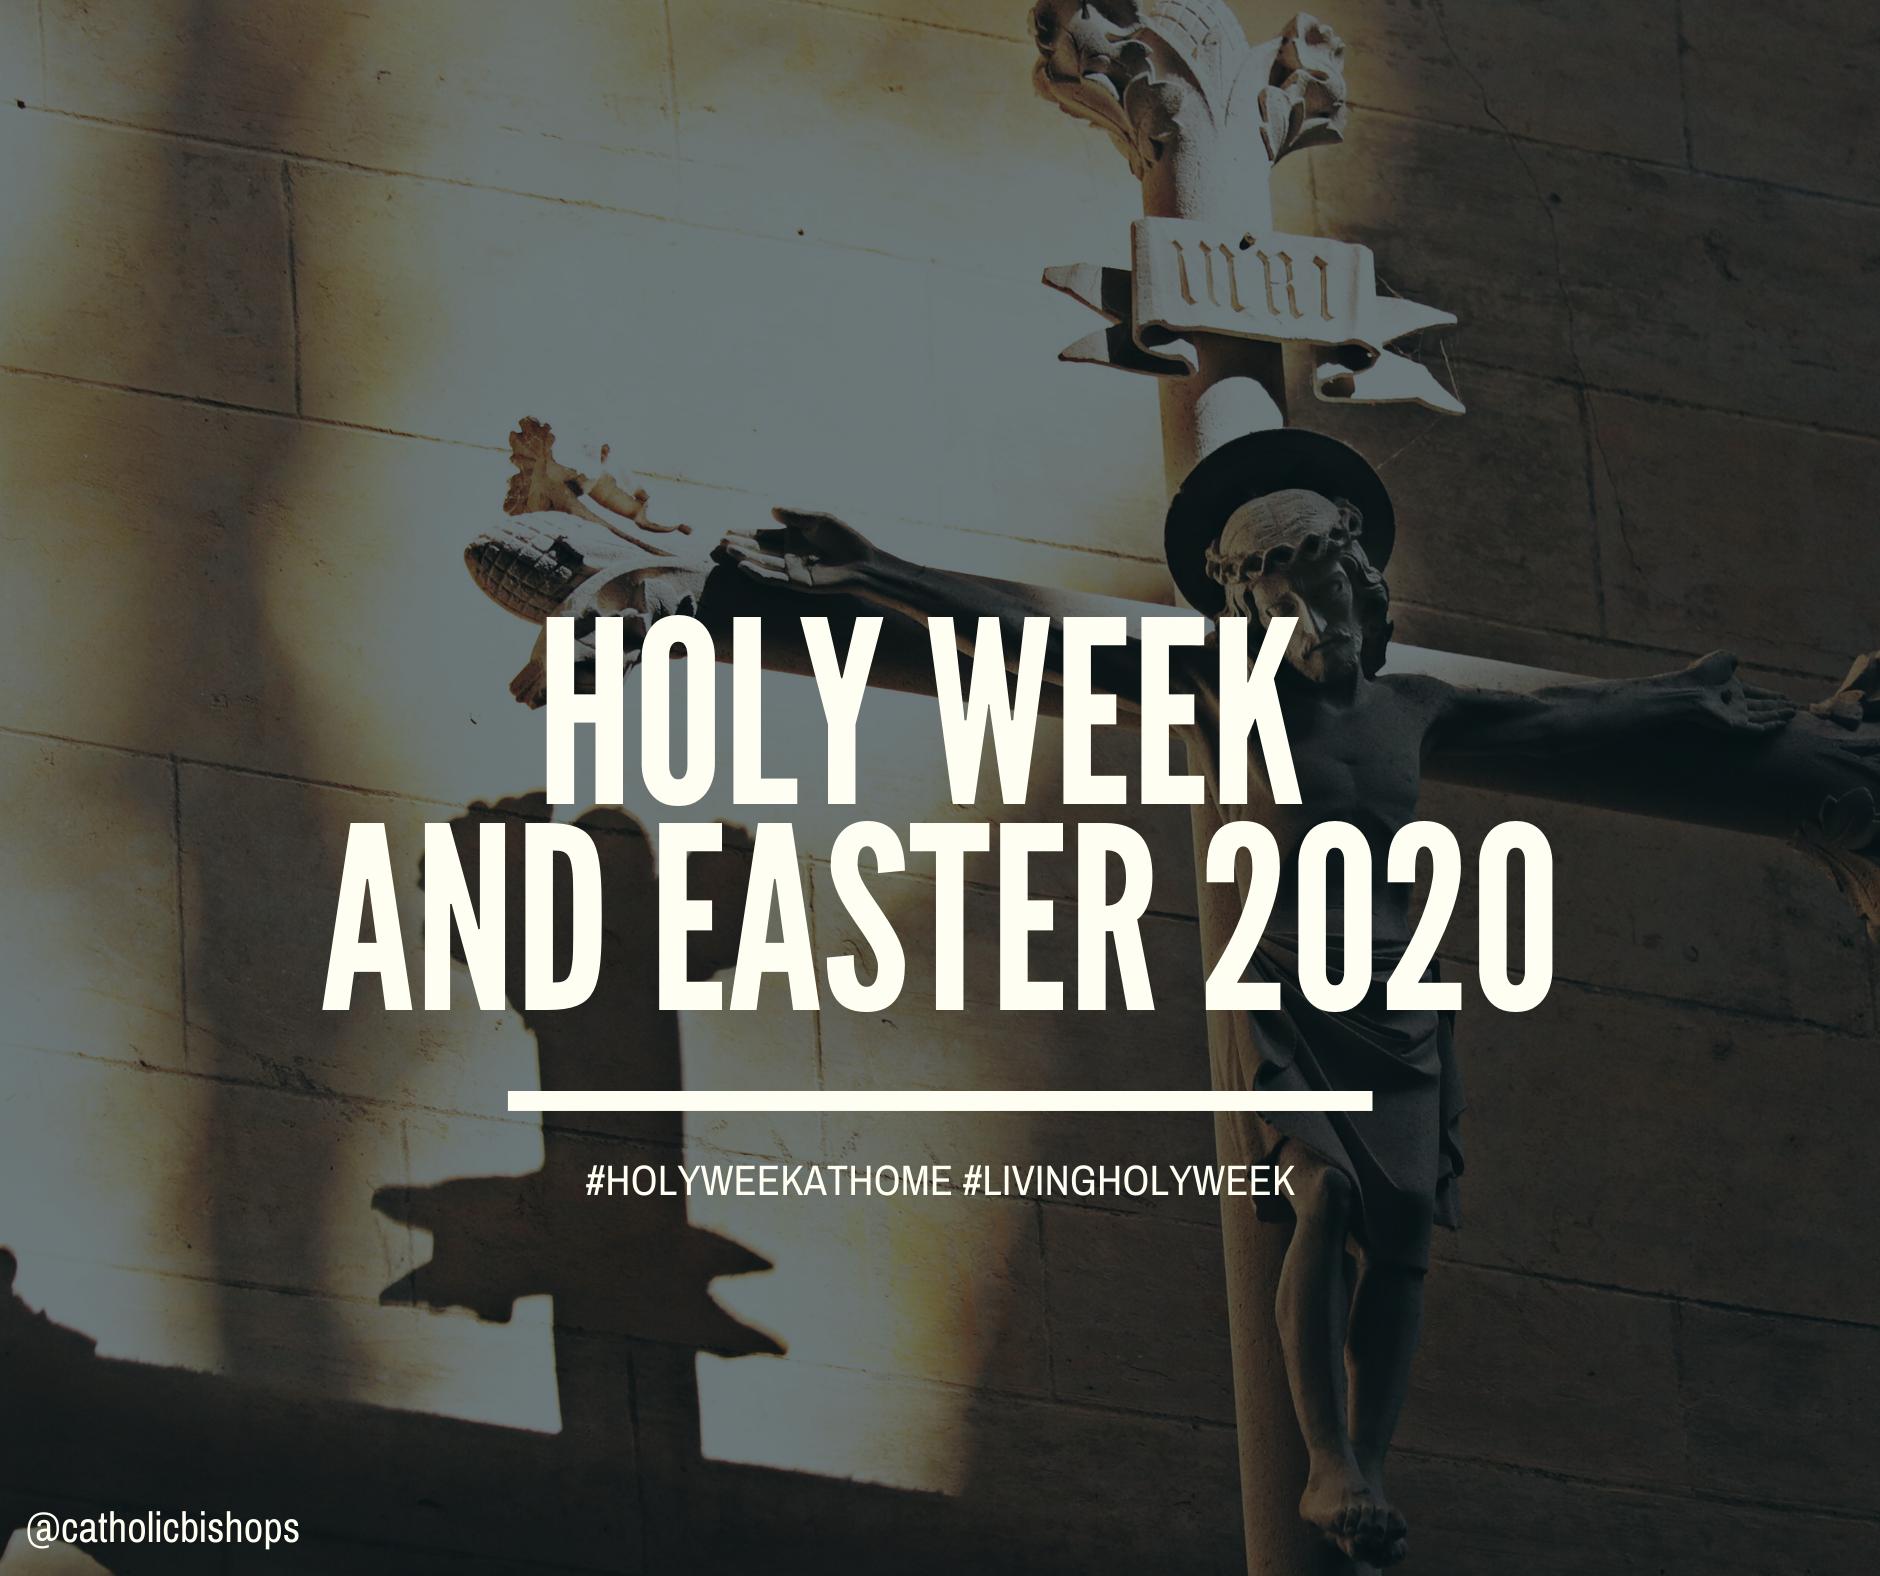 Holy Week and Easter 2020 | Irish Catholic Bishops' Conference